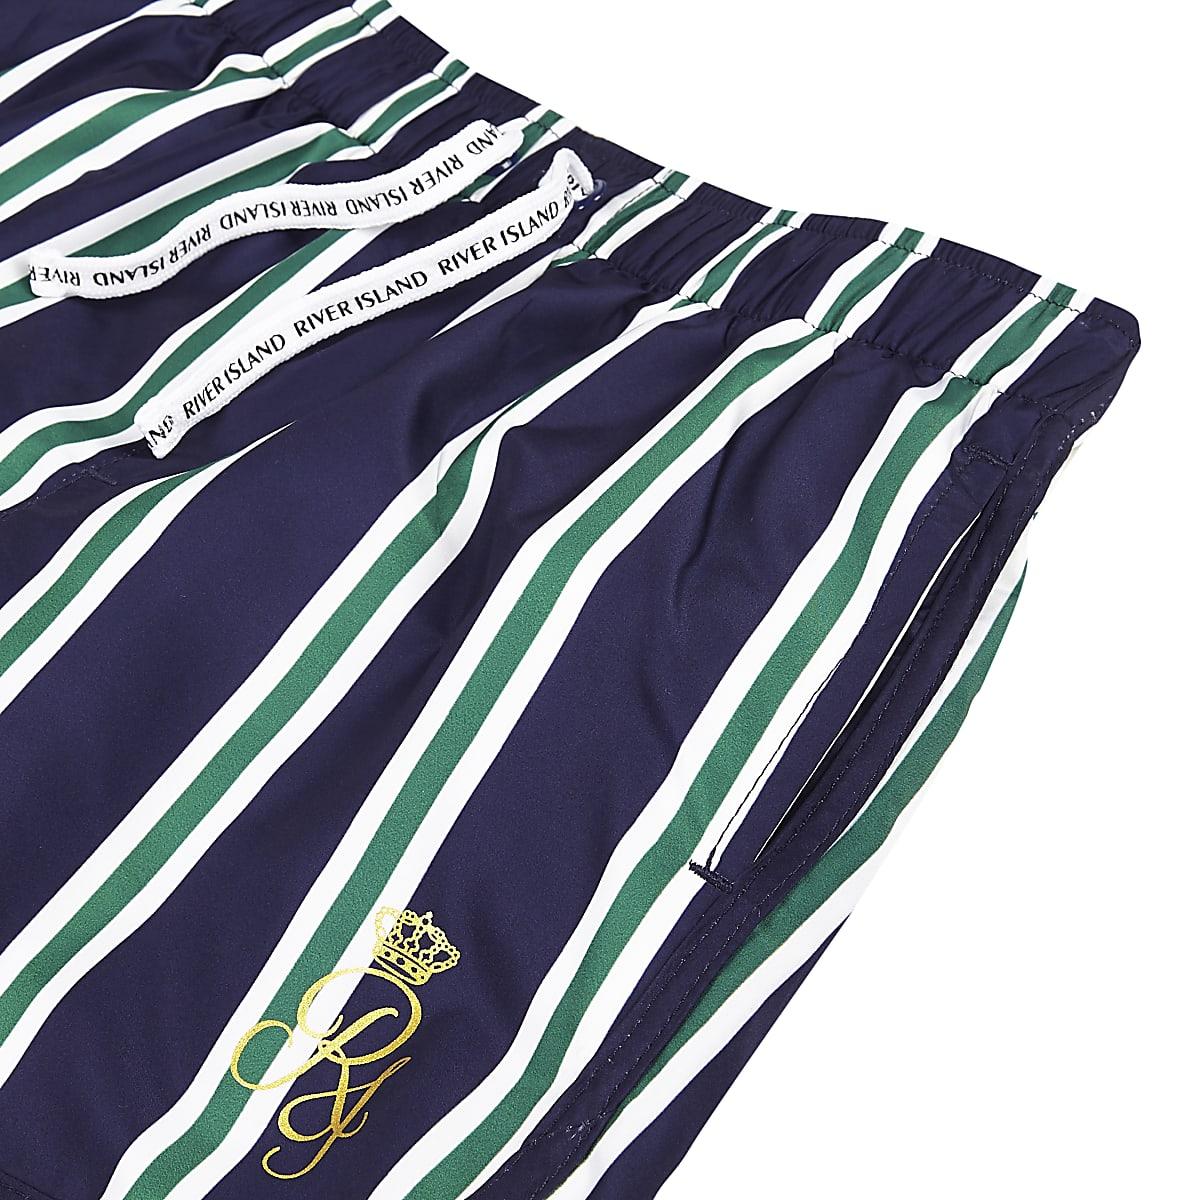 a330ce3cdb Boys navy stripe RI runner swim shorts - Swim Shorts - boys